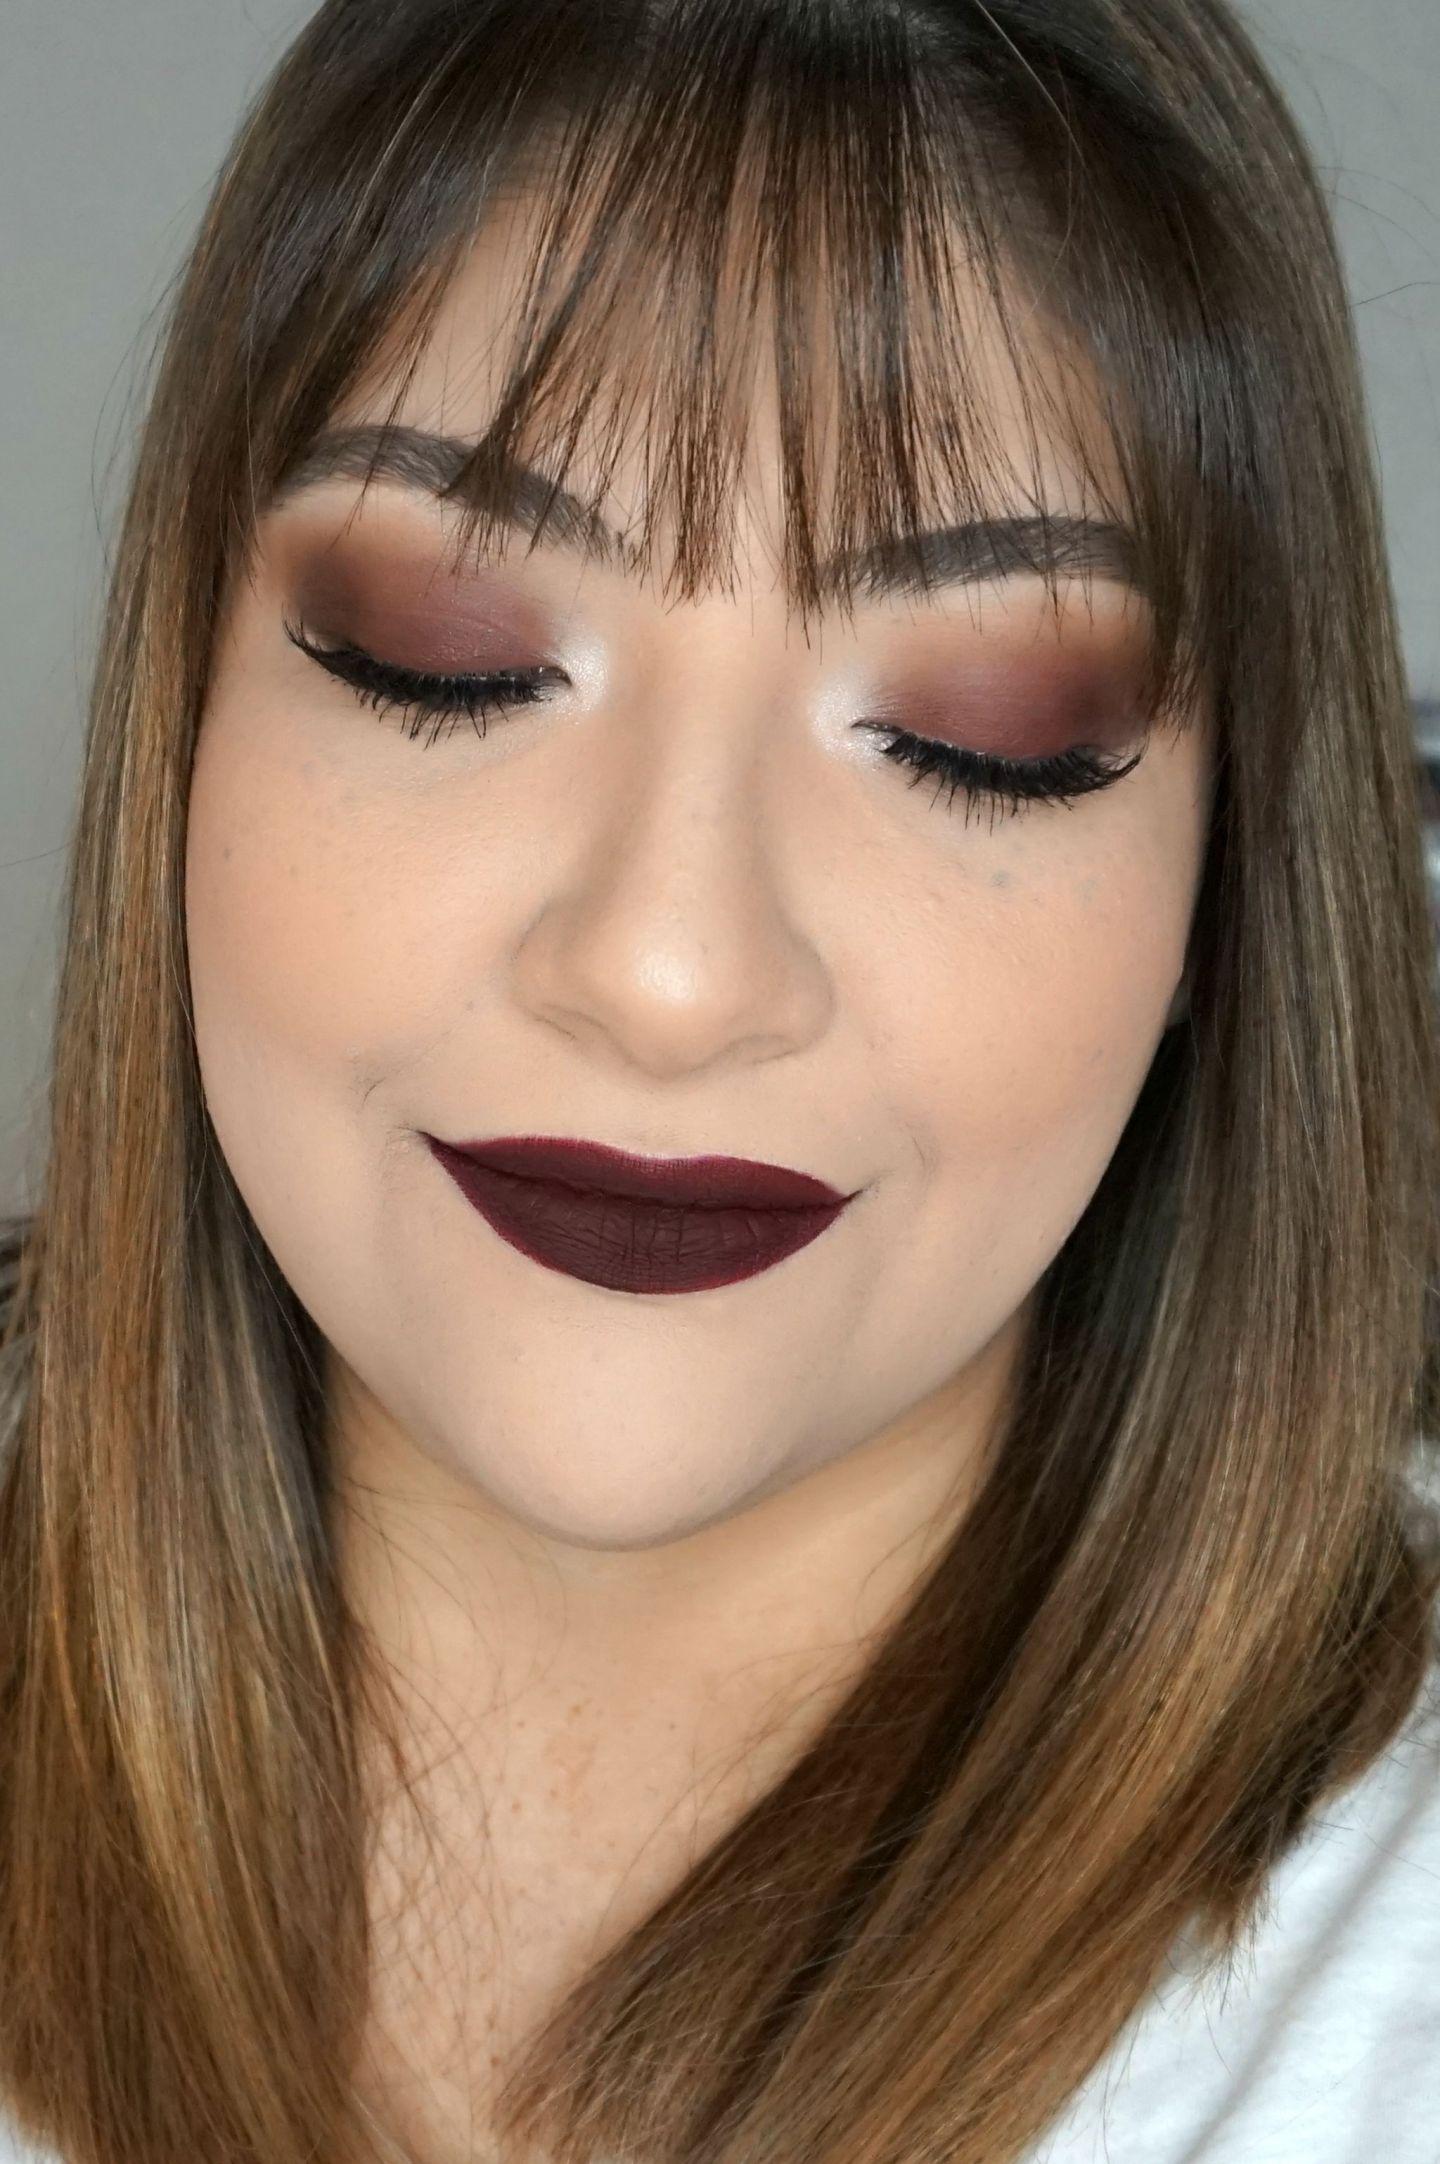 Vampy Makeup Look // Dark Makeup Look // Fall Makeup // Vampy Lips // Smokey Eyes // Dark Lipstick // Burgundy Makeup | Beauty With Lily